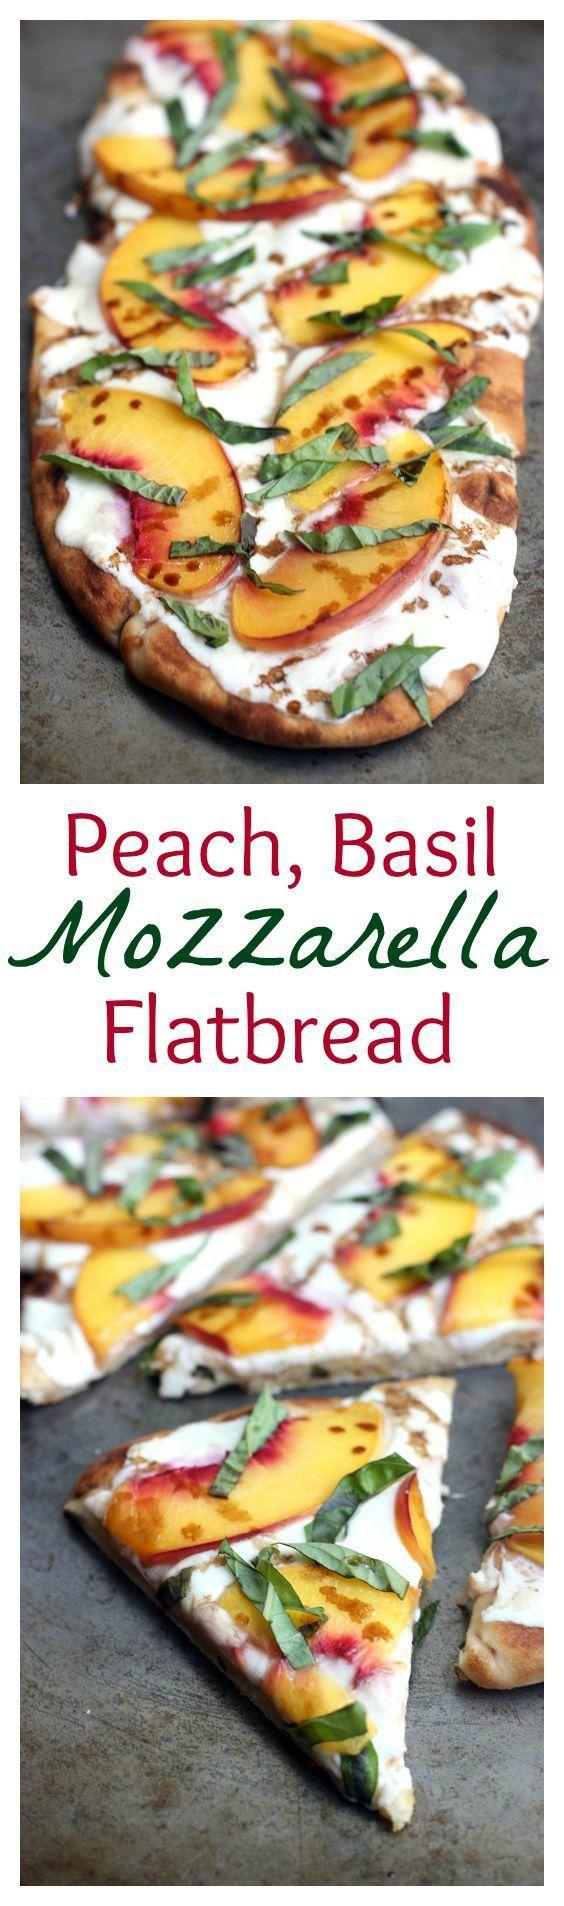 Peach, Basil, Mozzarella Flatbread with balsamic reduction. Recipe on http://TastesBetterFromScratch.com